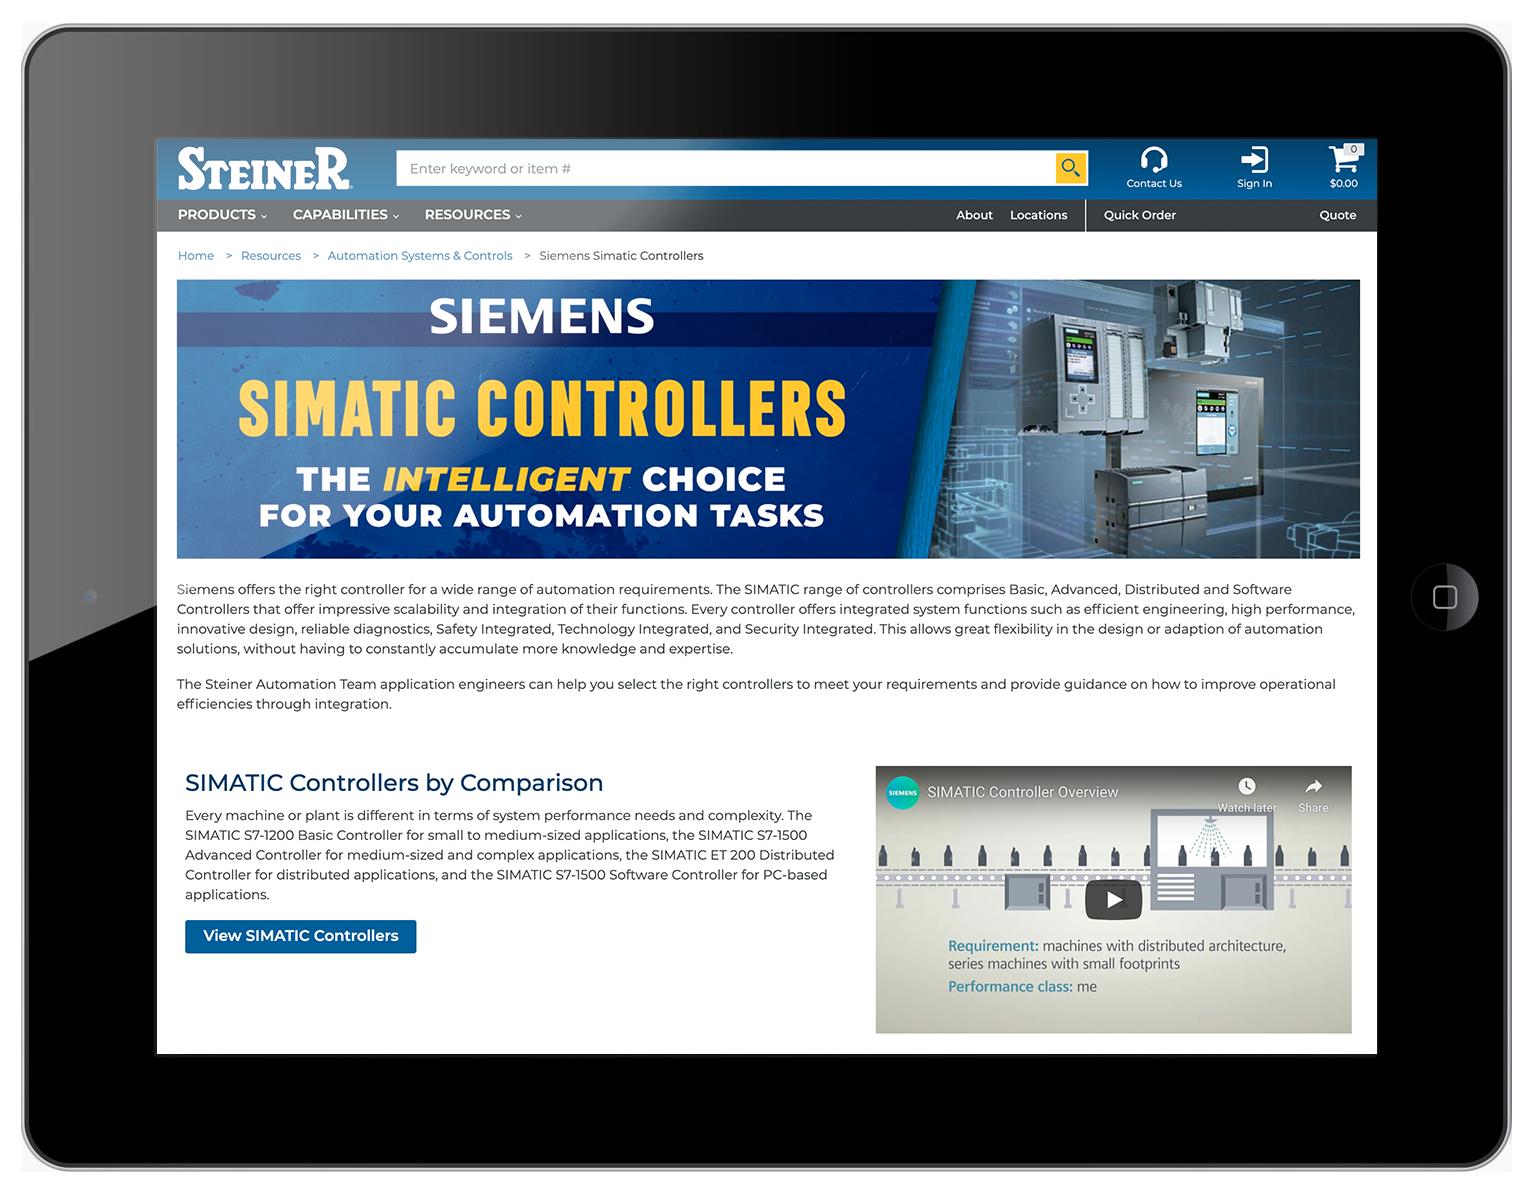 Siemens Simatic Controllers